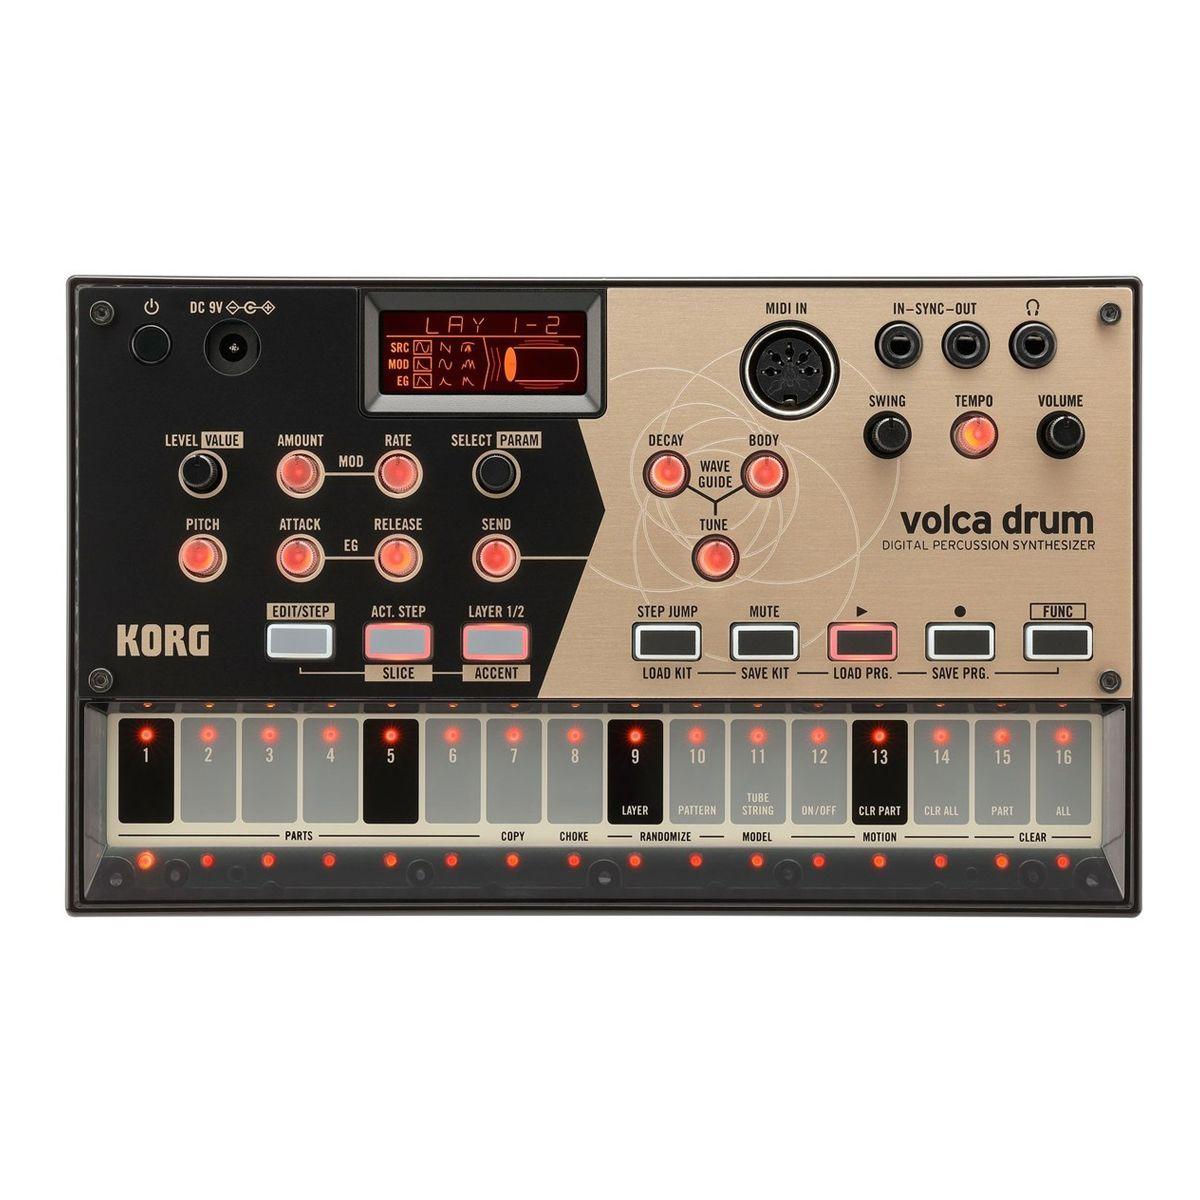 Korg Volca Drum Desktop Percussion Synth